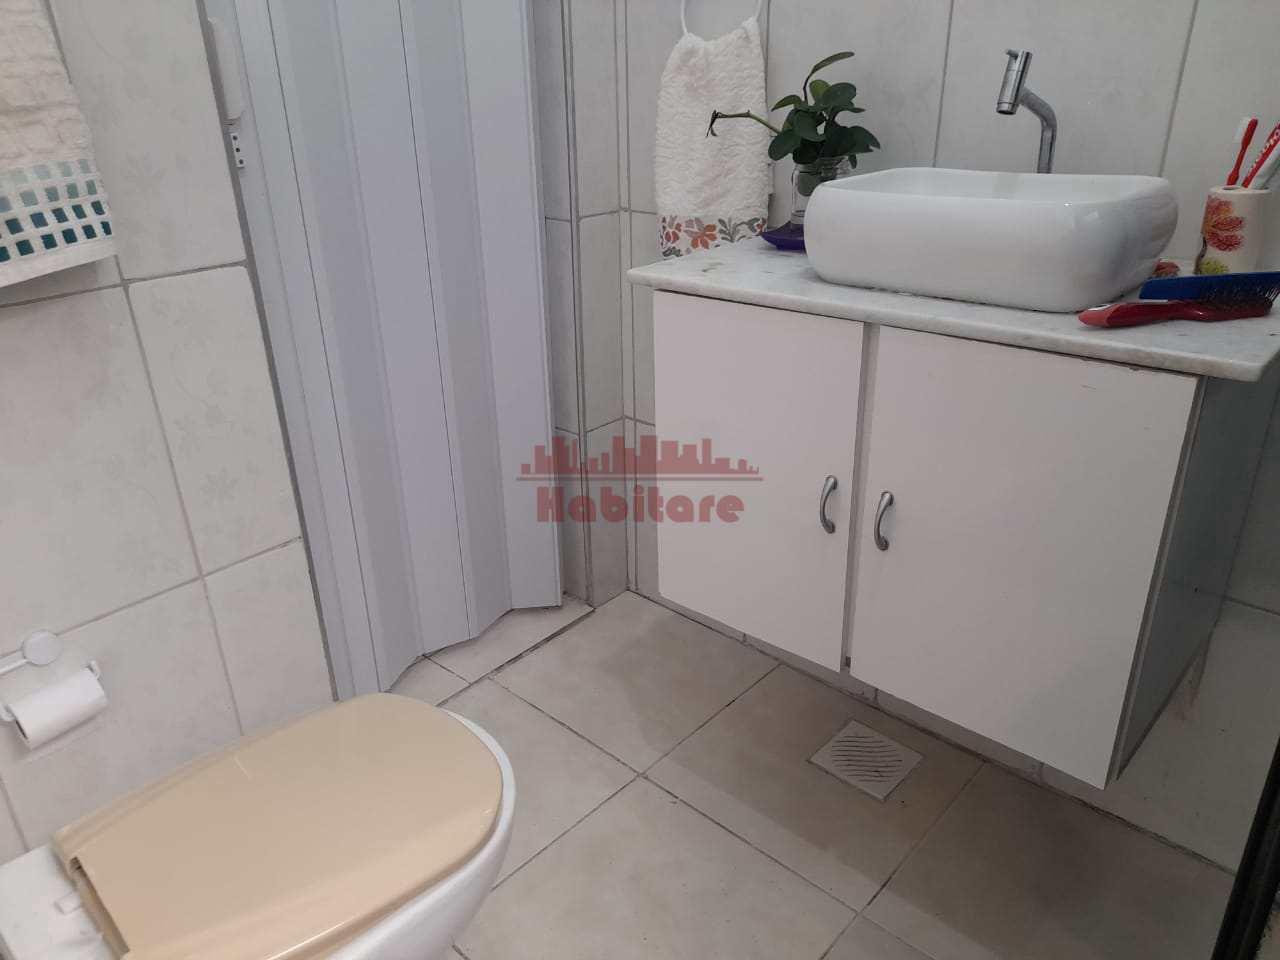 Kitnet com 1 dorm, Canto do Forte, Praia Grande - R$ 130 mil, Cod: 662632